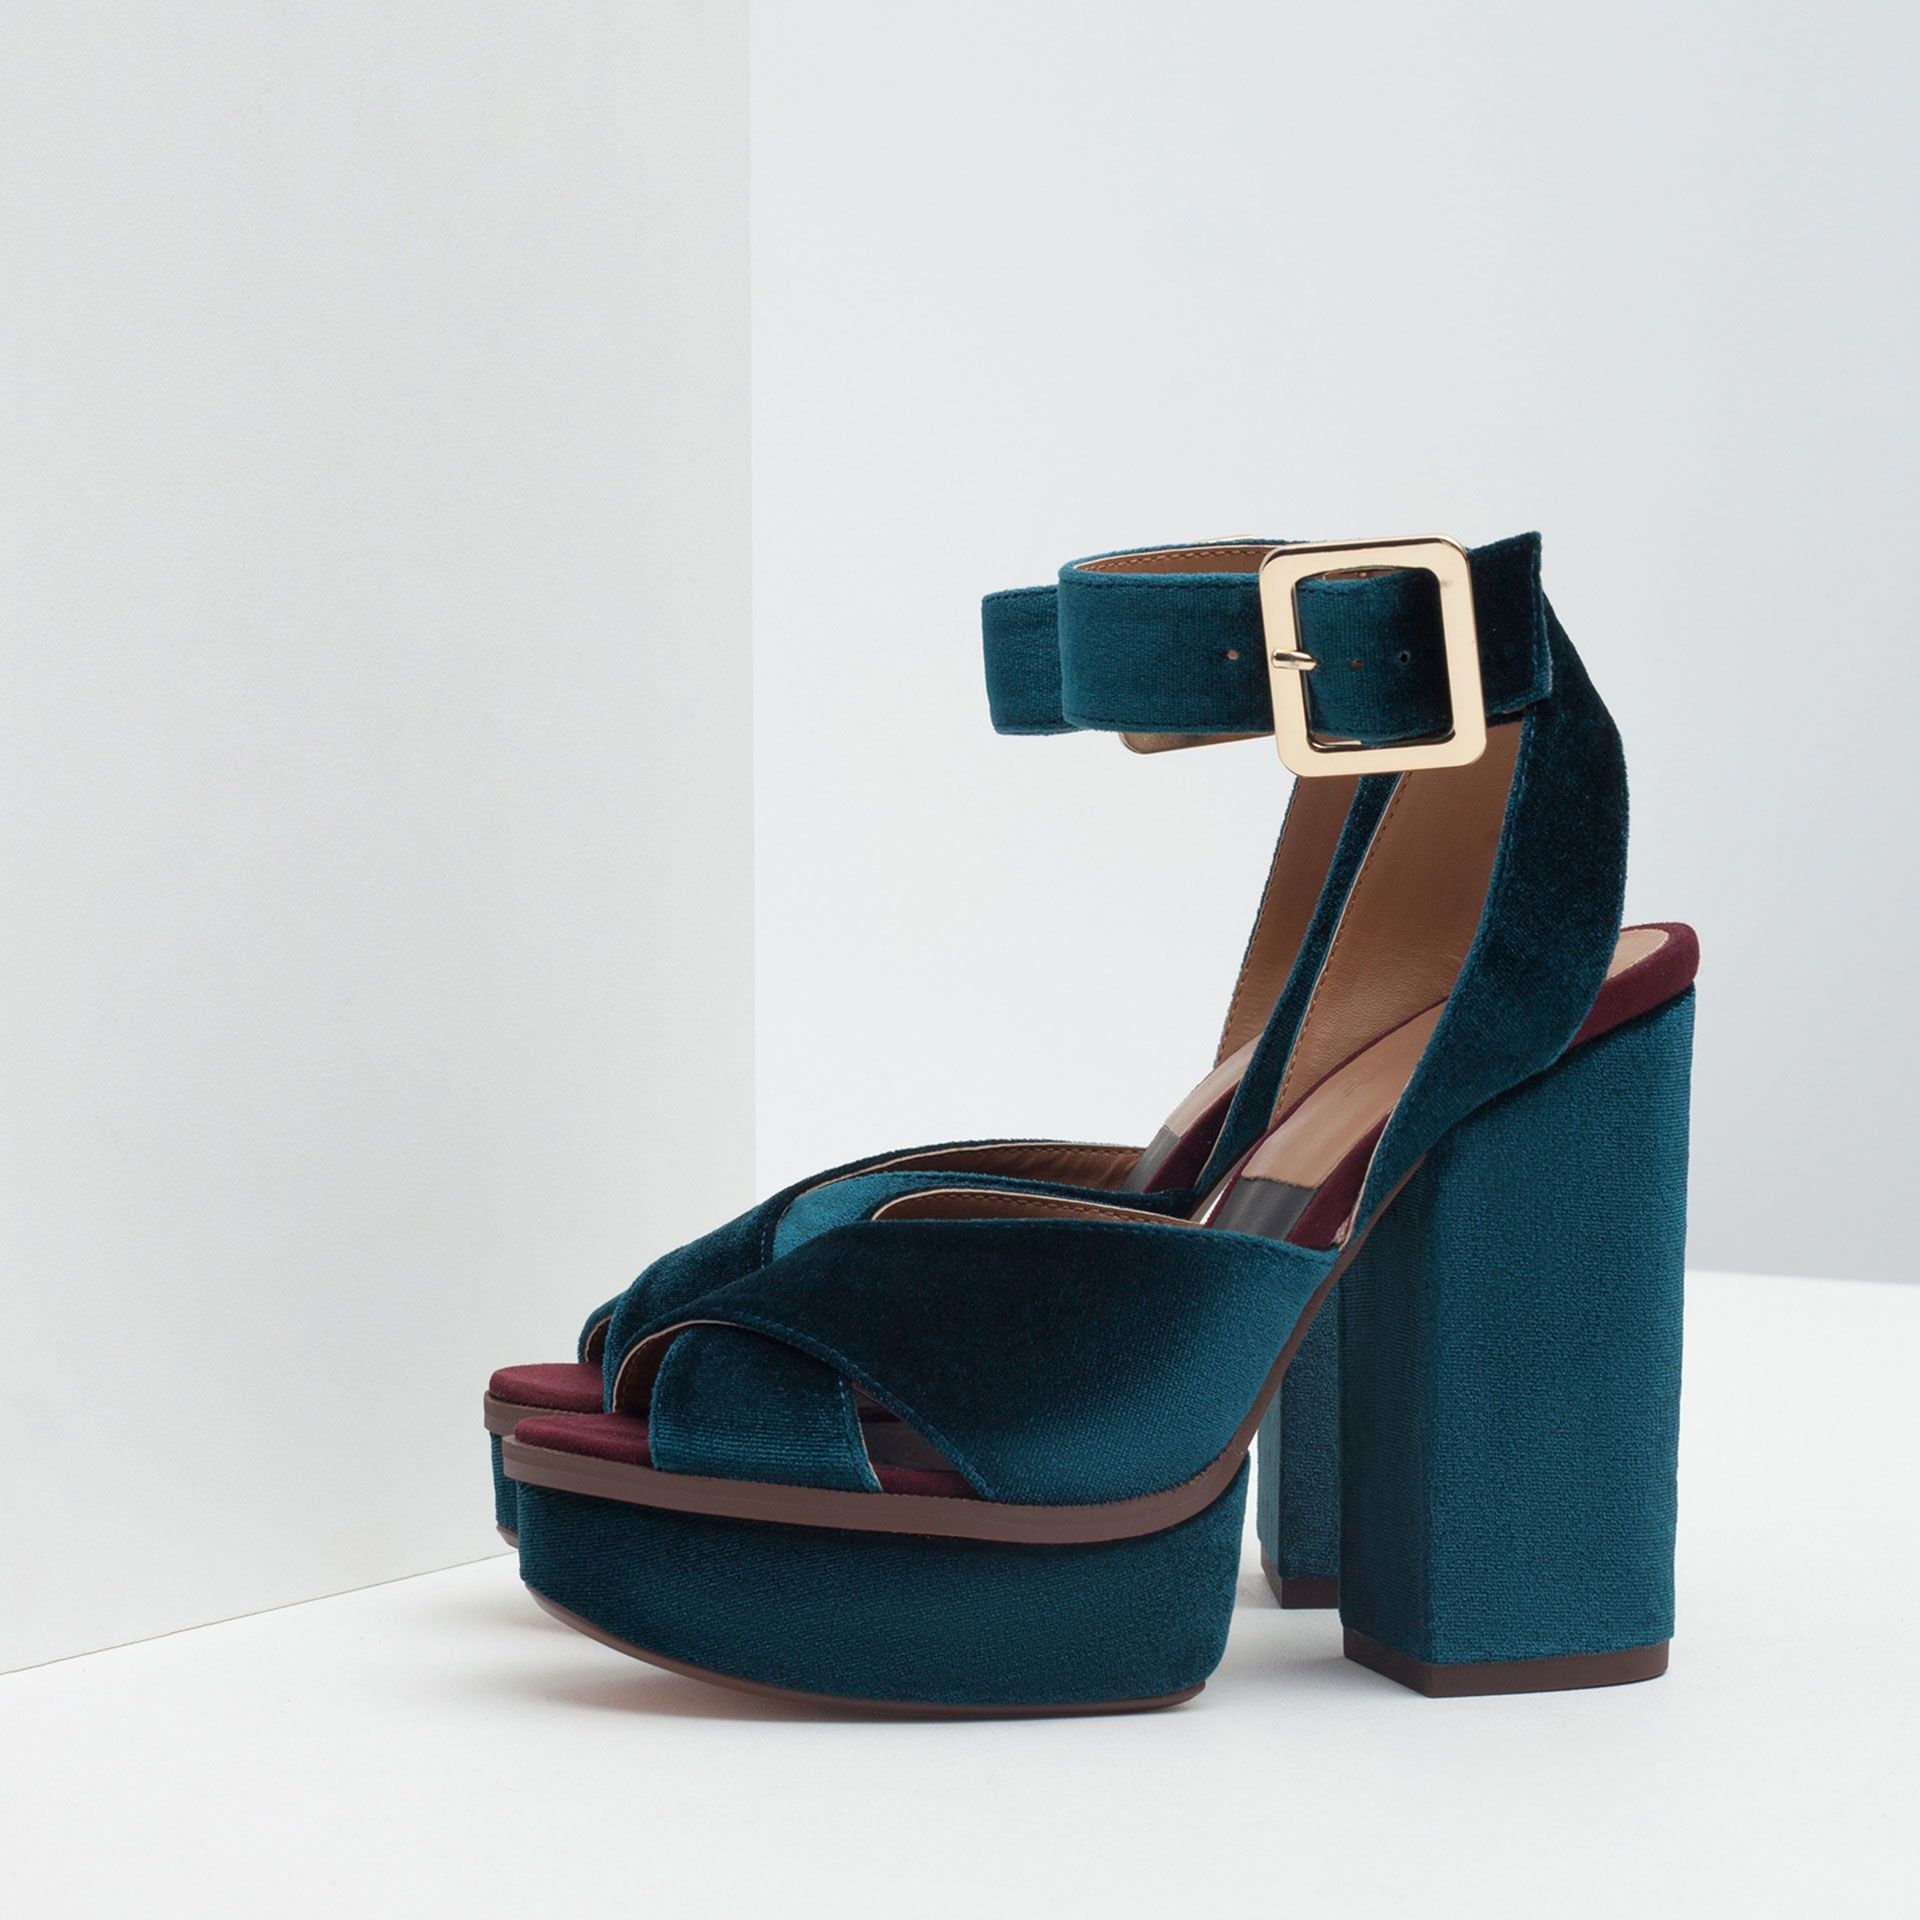 206aec4709c0 ZARA Velvet Platform Sandals